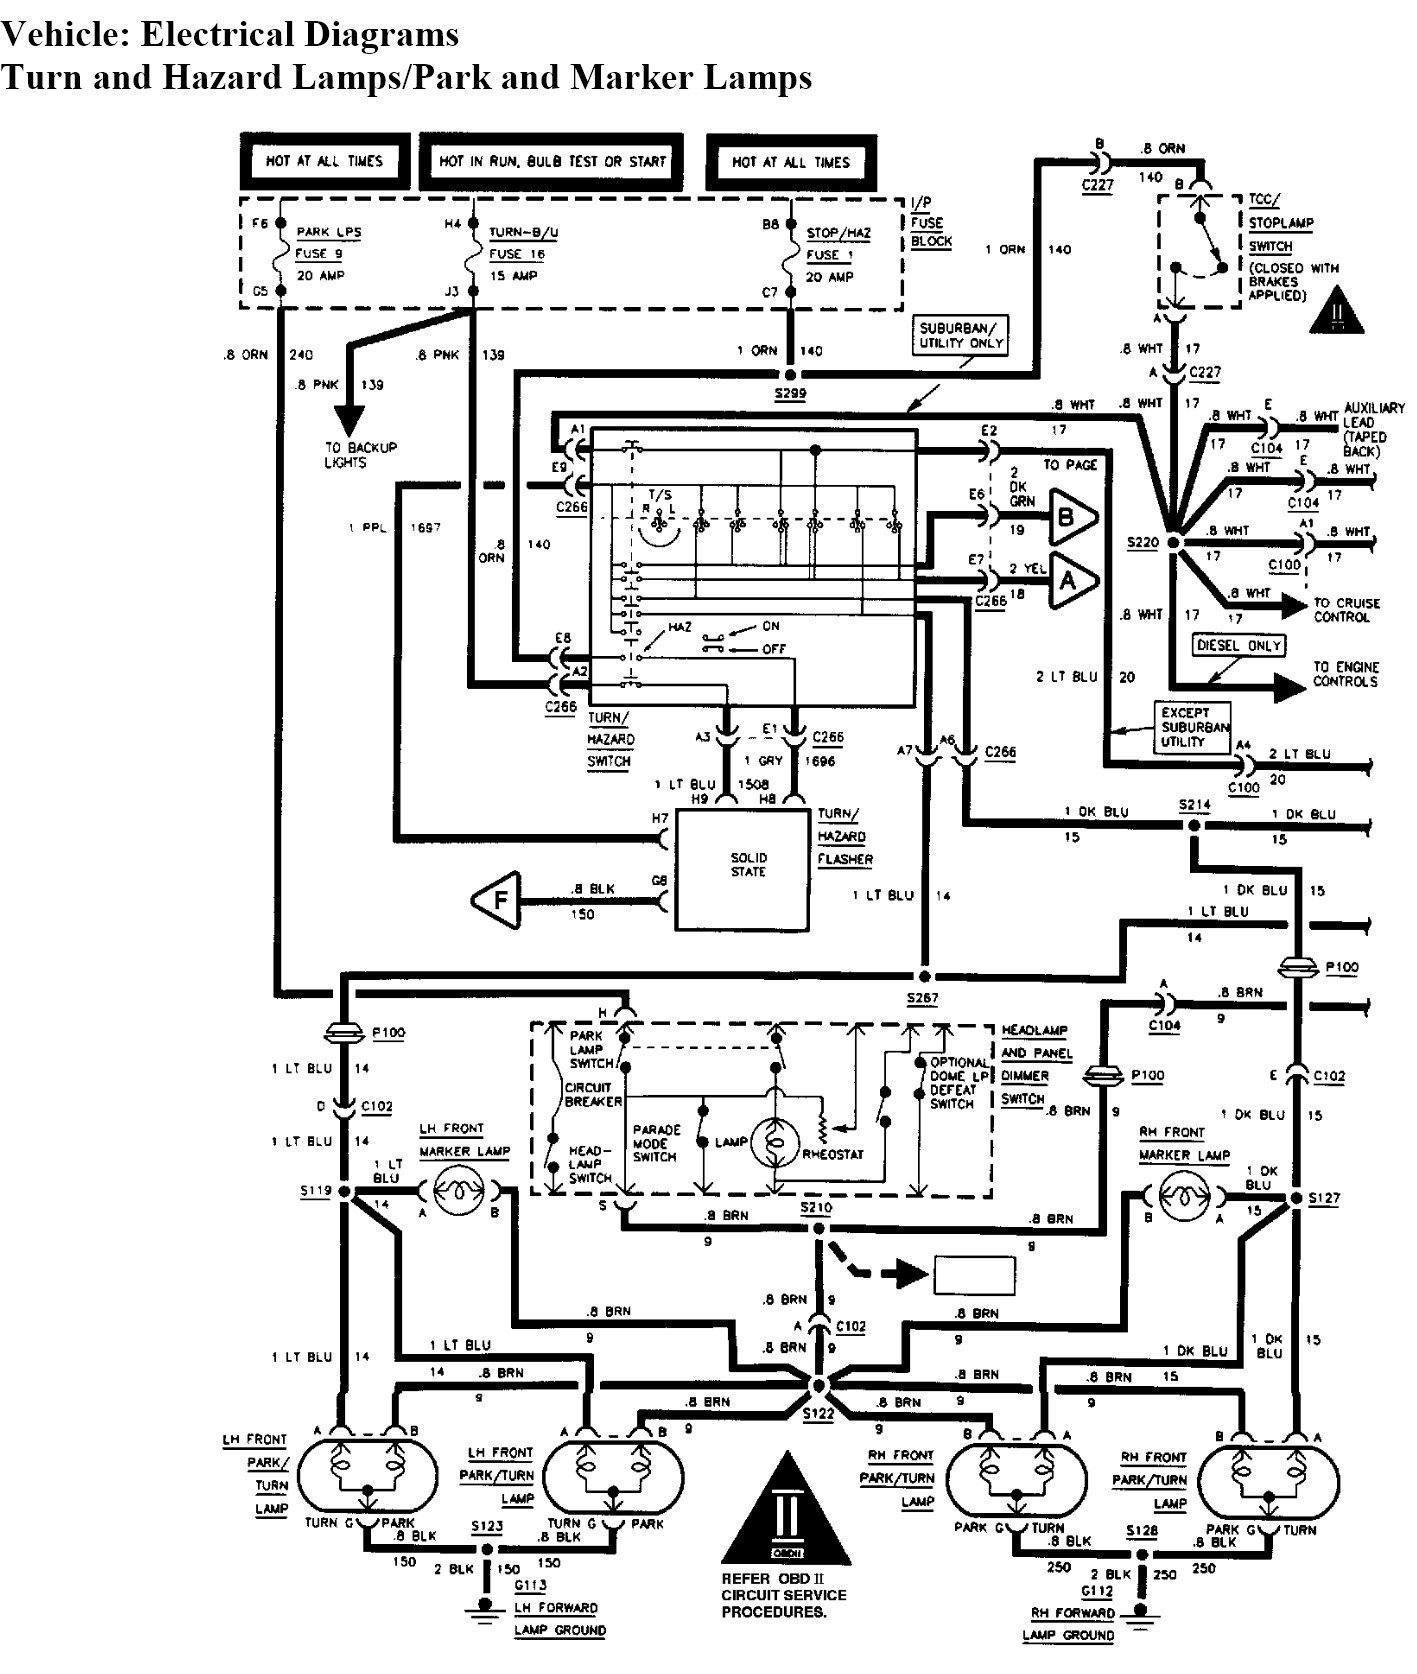 1977 Chevy Truck Vacuum Diagram 1983 Chevy Truck Vacuum Line Diagram Chevrolet Wiring Diagrams Types Of 1977 Chevy Truck Vacuum Diagram